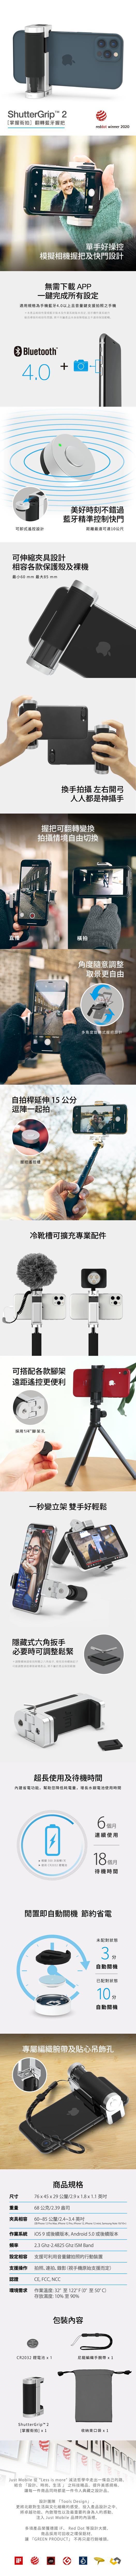 Just Mobile|ShutterGrip™ 2【掌握街拍 2】翻轉藍牙握把 GP-200BK